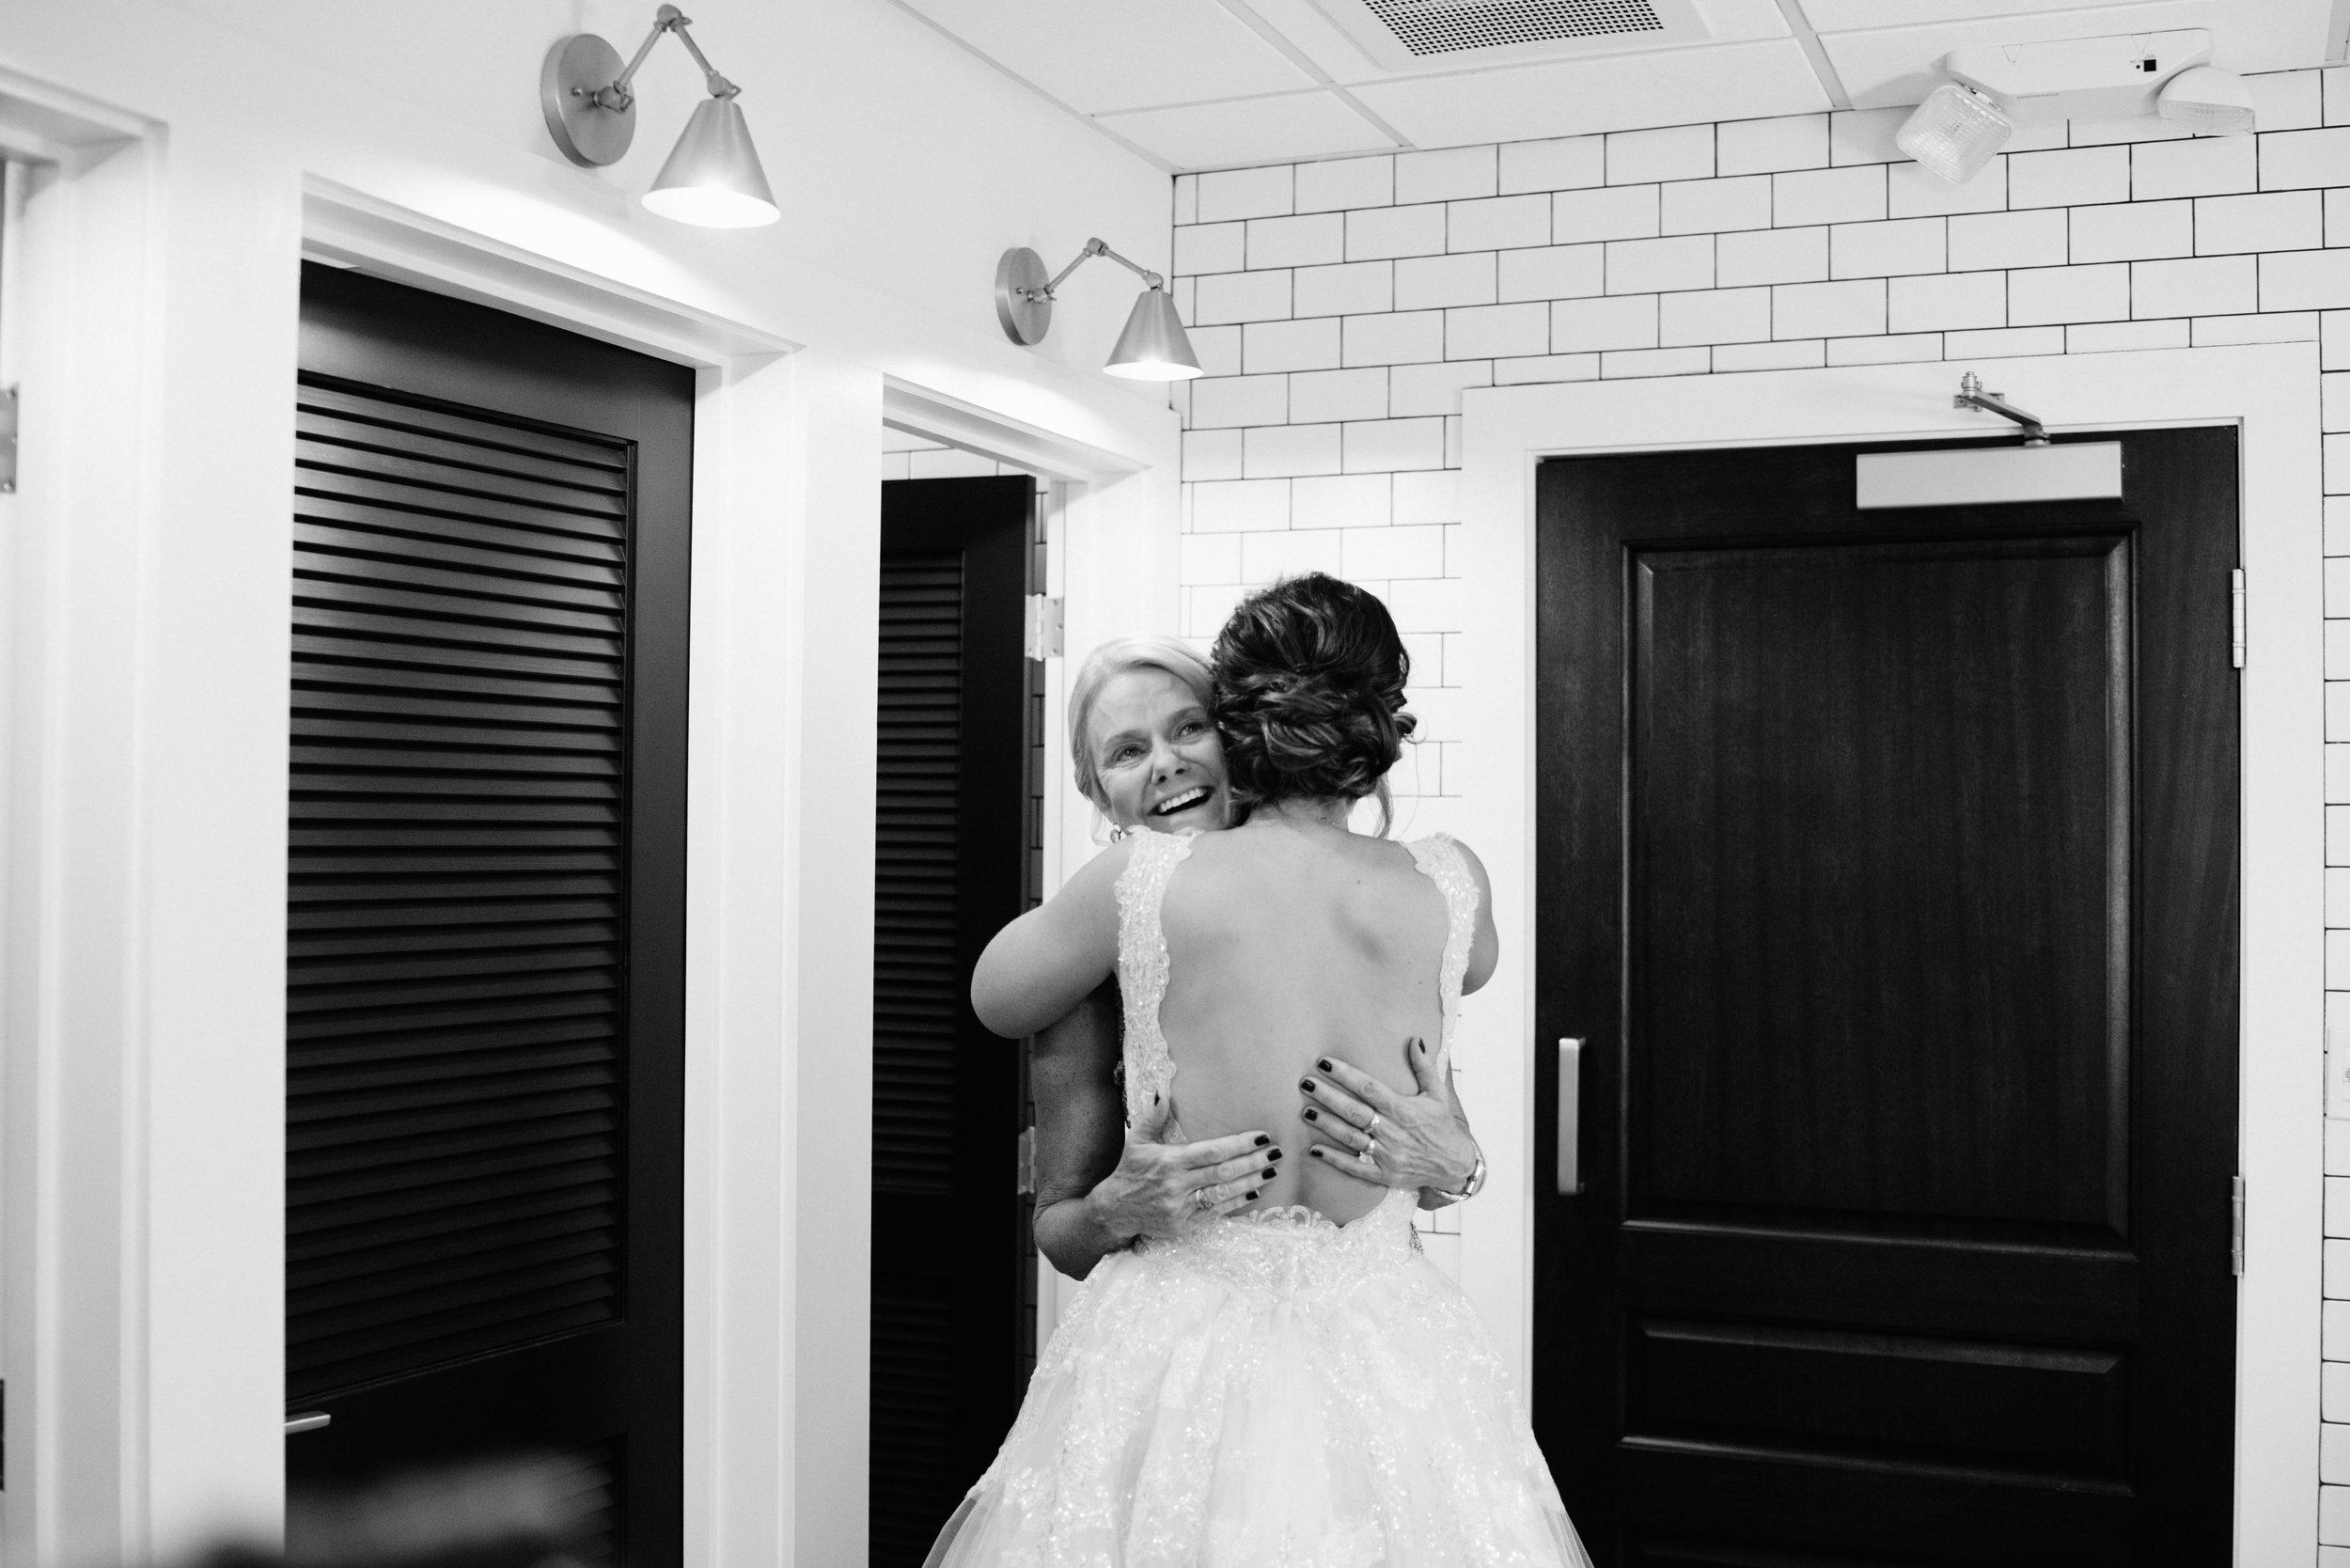 Carlee-Bob-Indianapolis-Wedding-Blog-19.jpg